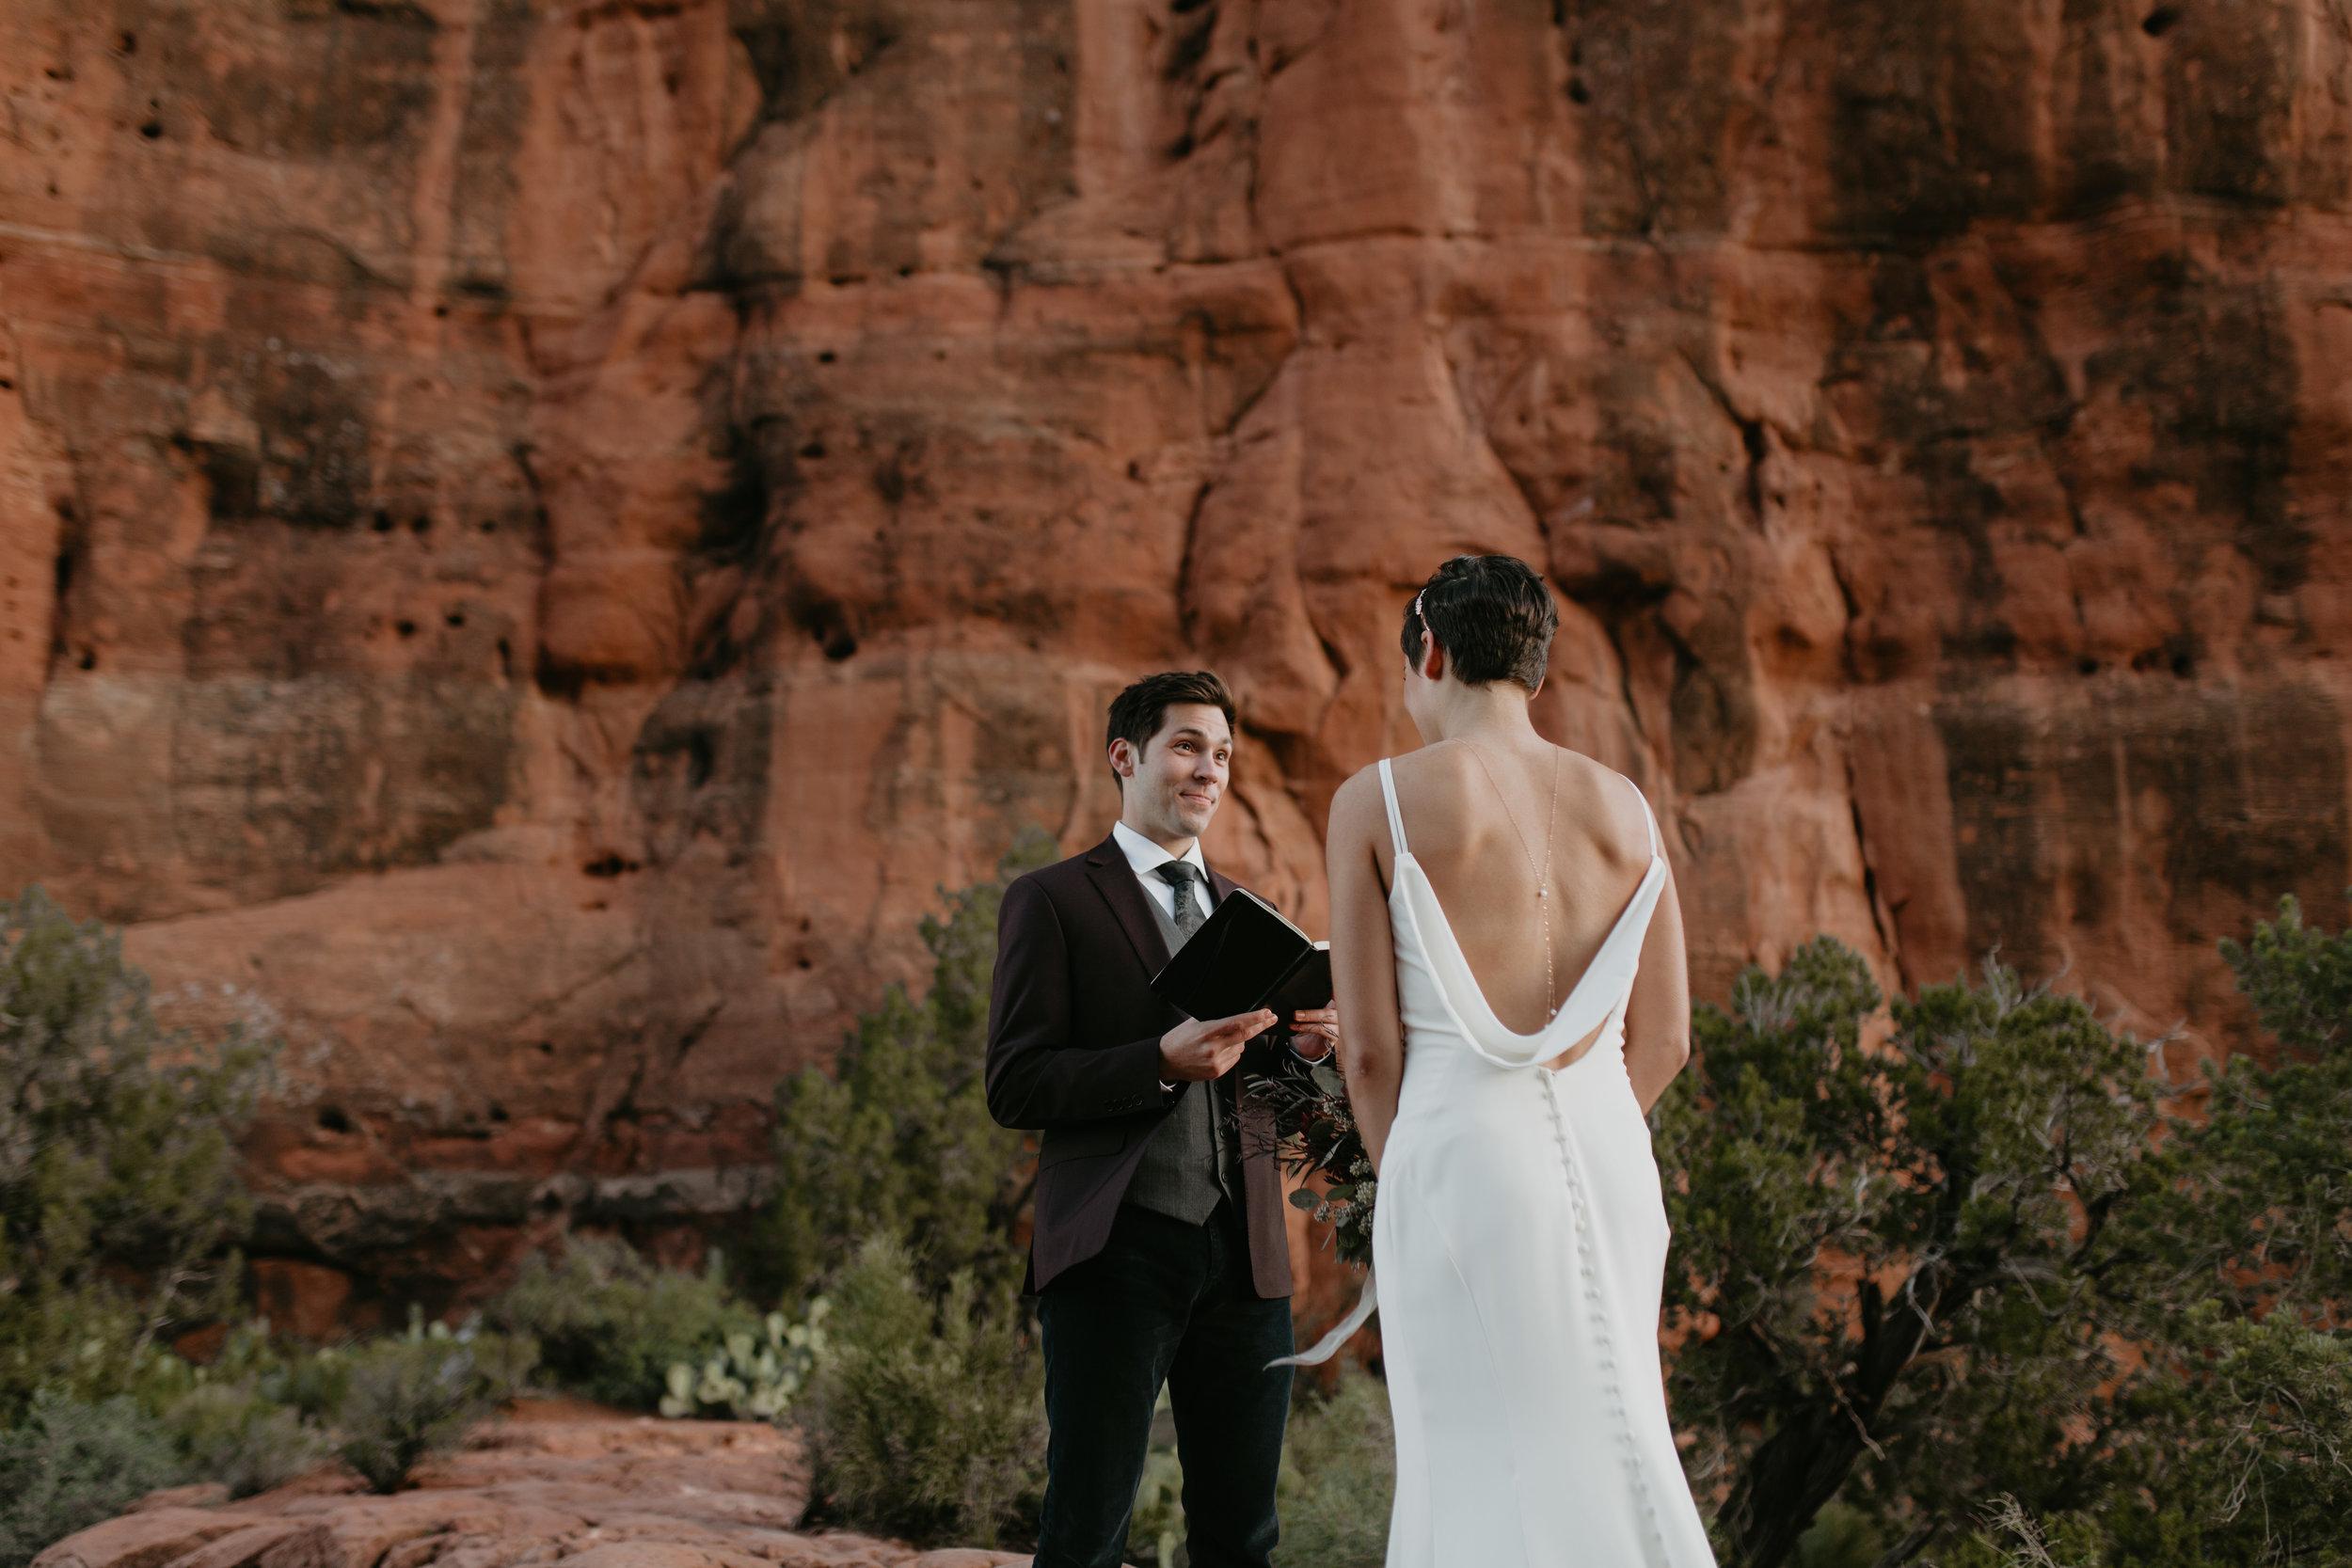 nicole-daacke-photography-sedona-arizona-destination-elopement-wedding-photographer-catherdral-rock-hiking-elopement-sedona-river-elopement-photos-desert-rock-wedding-photographer-laid-back-spontaneous-elopement-37.jpg